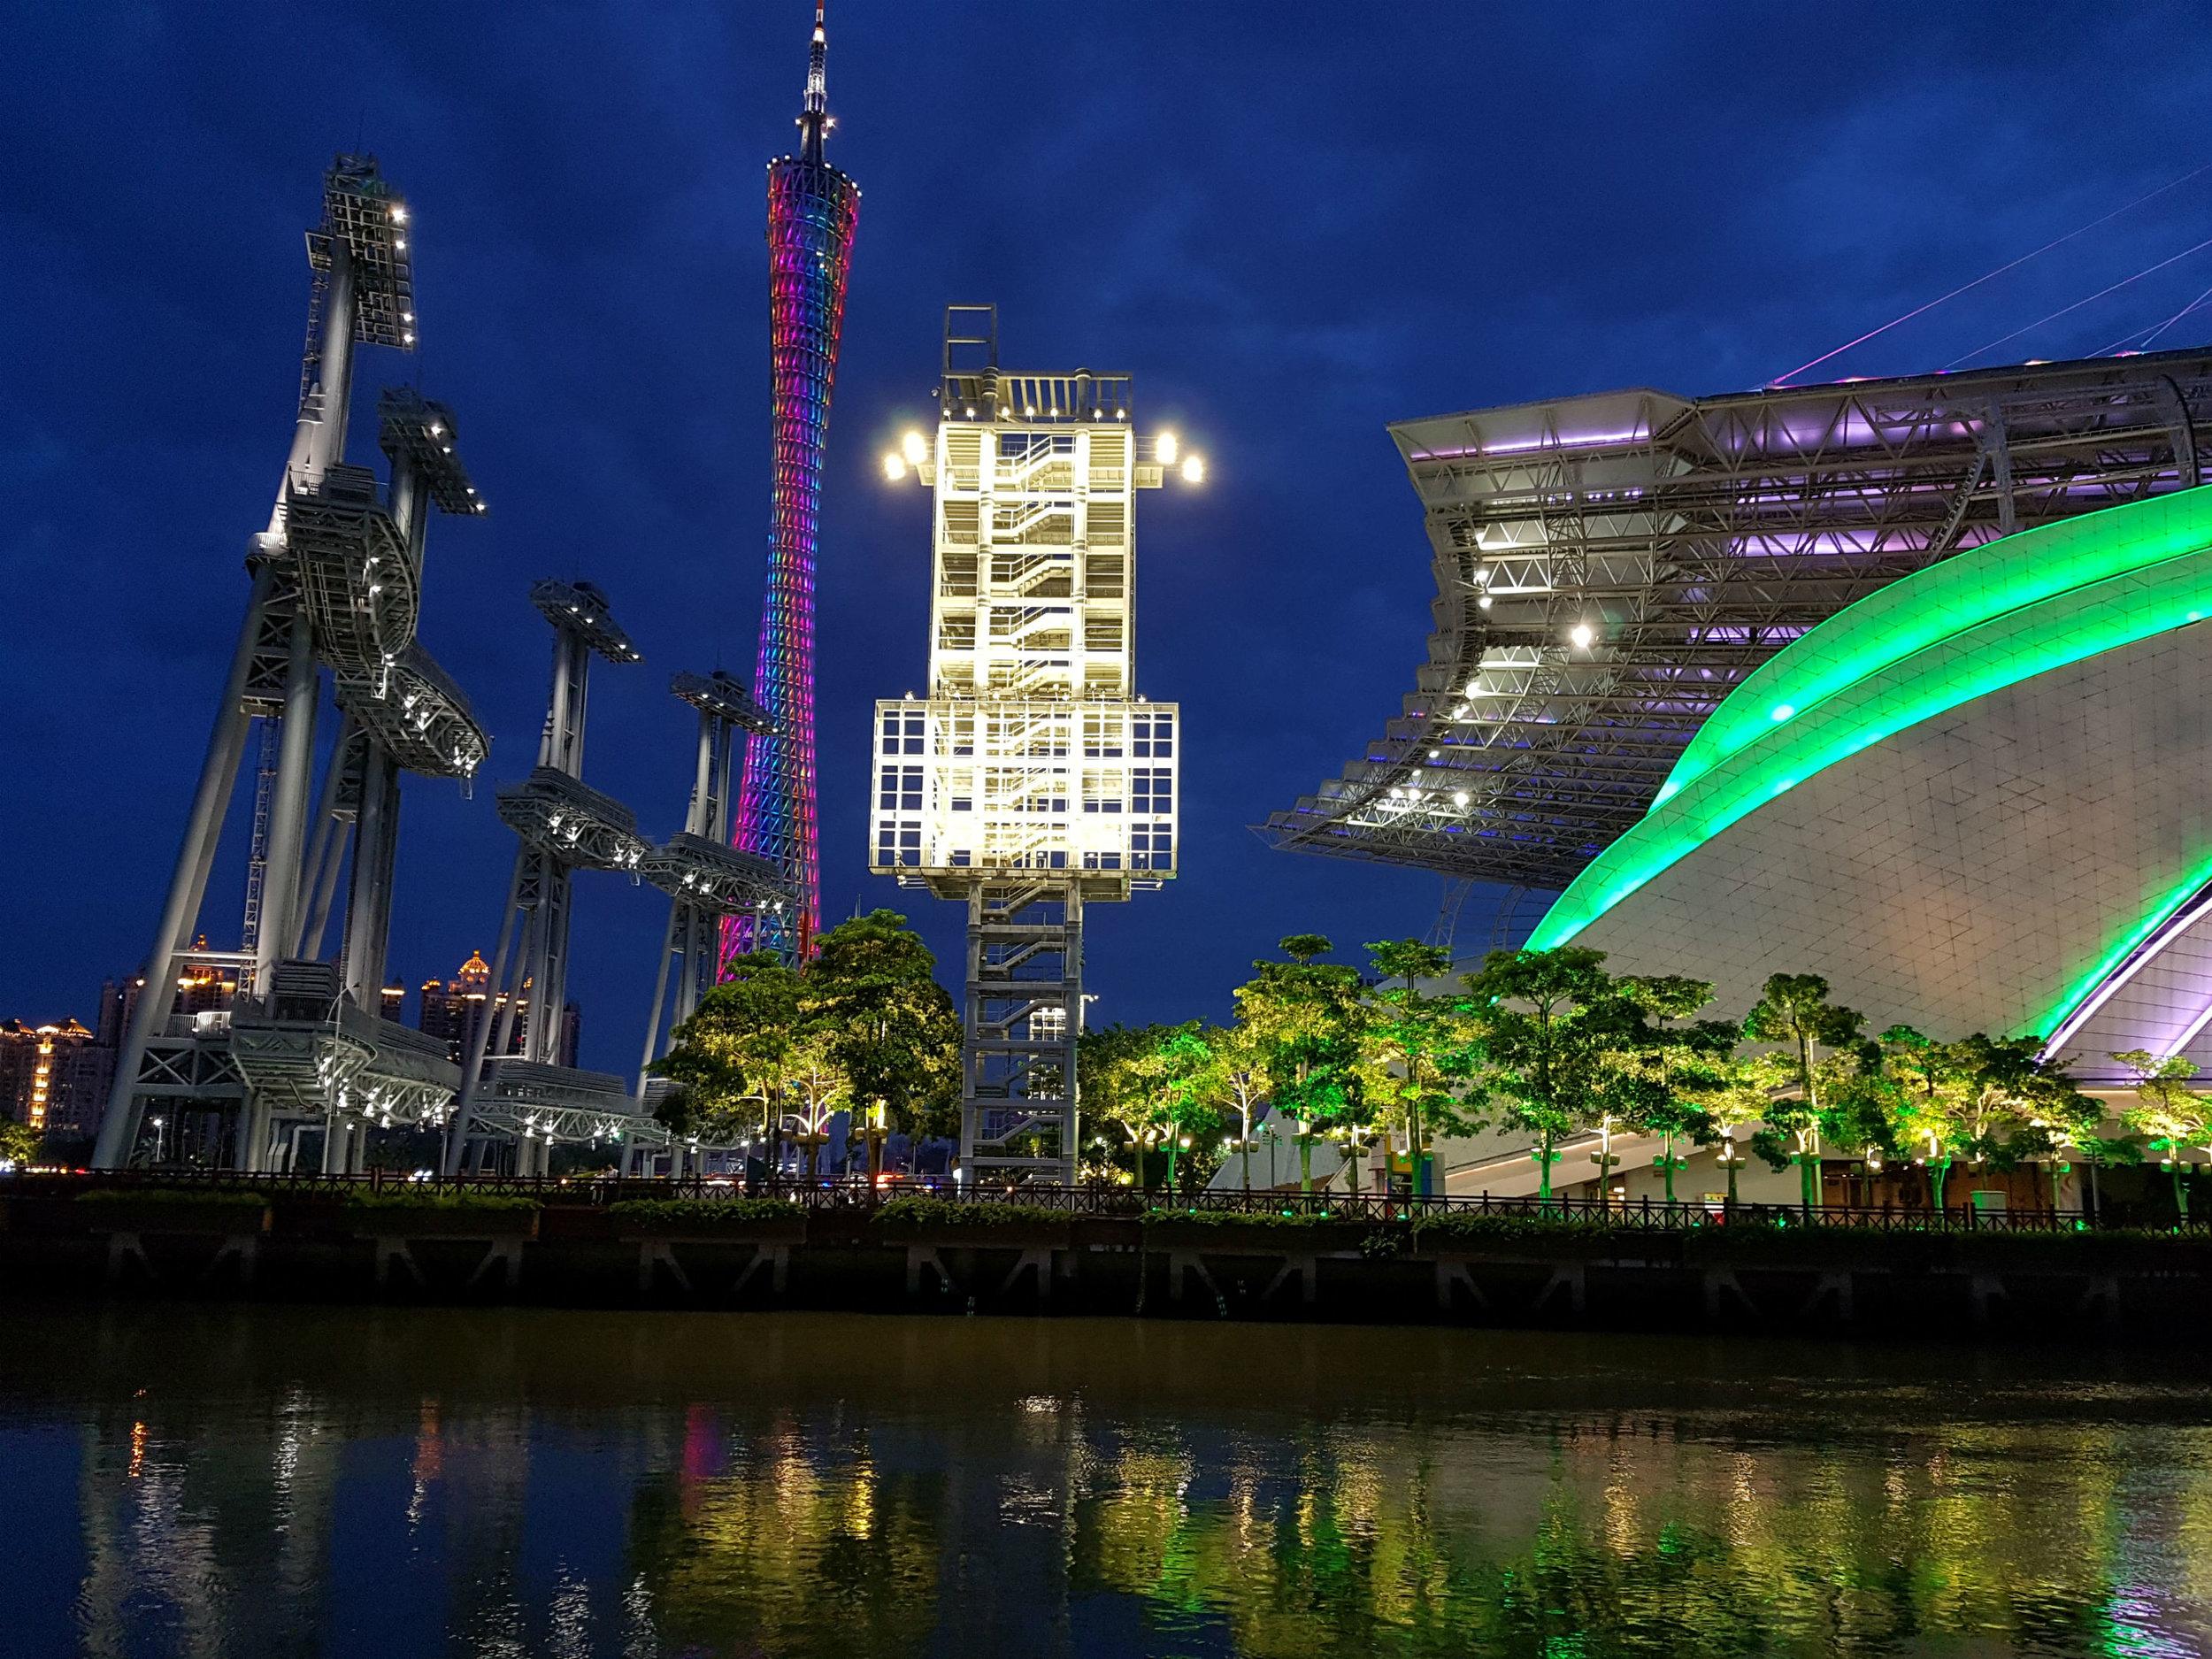 Guangzhou at night - it has a modern feel to it